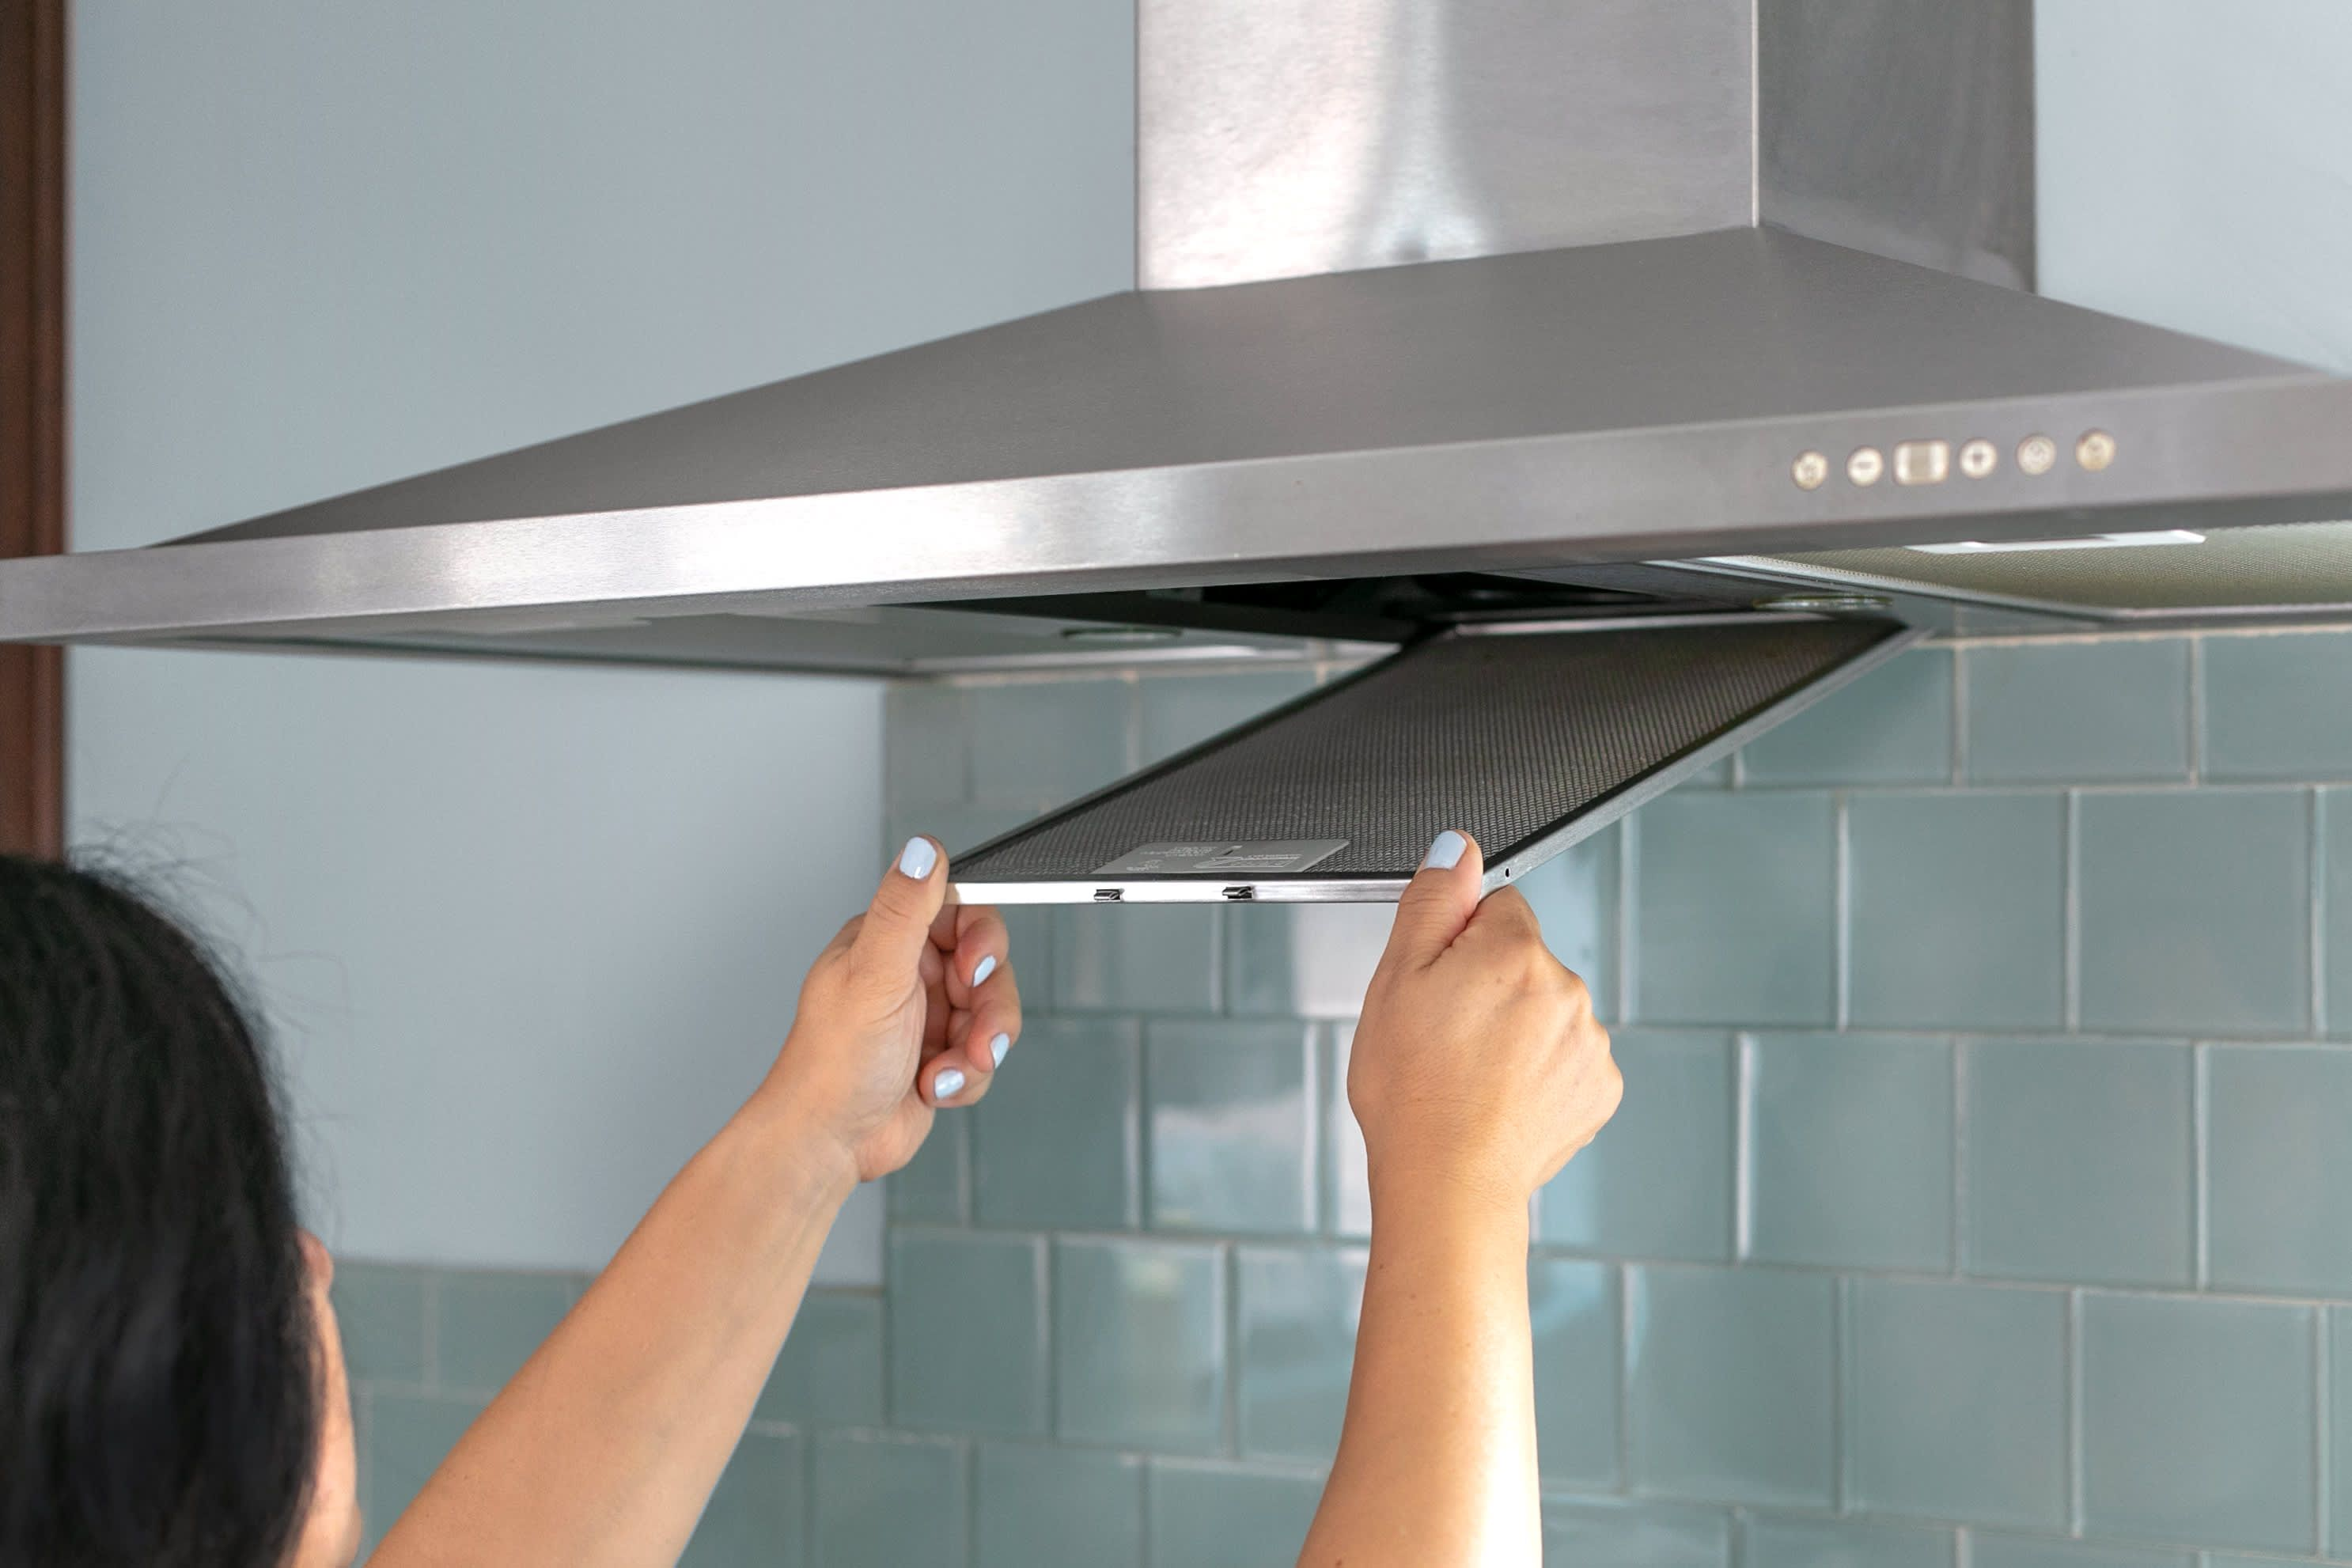 Hood Filter Maintenance Deep Clean Bathroom Bathroom Cleaning Stove Fan